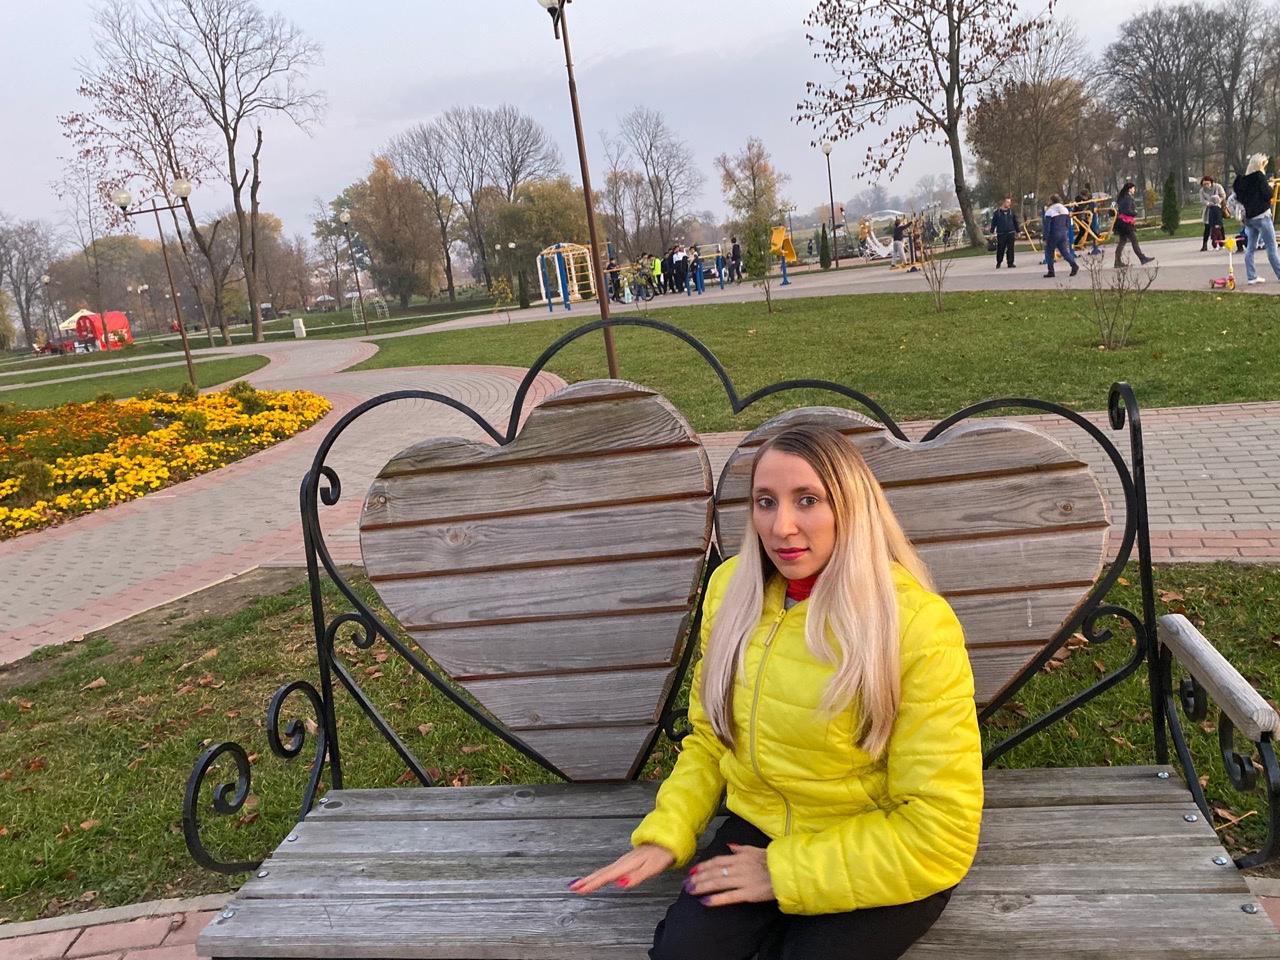 photo from album of Marinochka Milanka №13